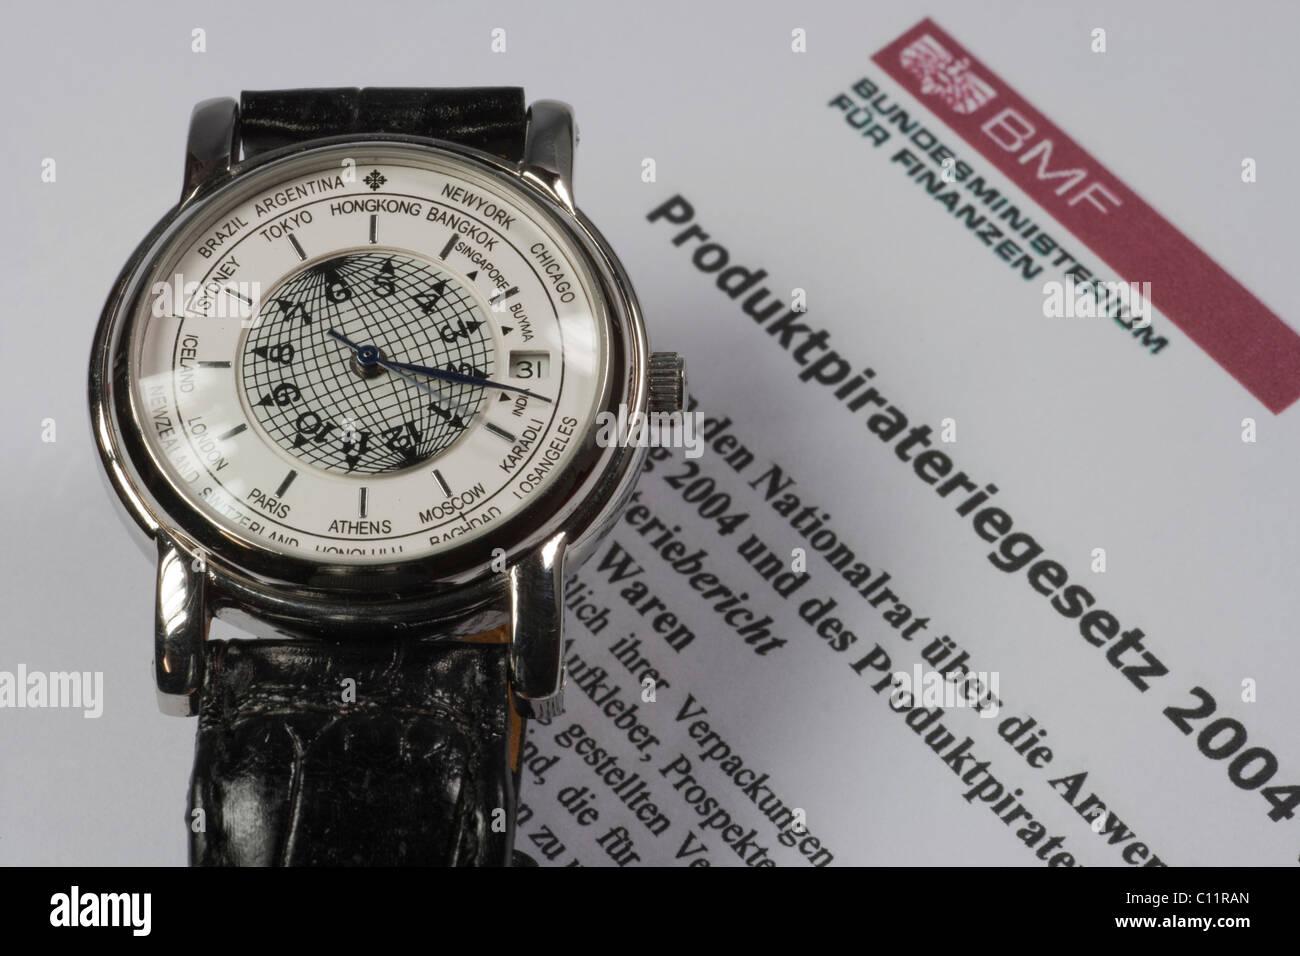 Fake luxury watch, product piracy - Stock Image